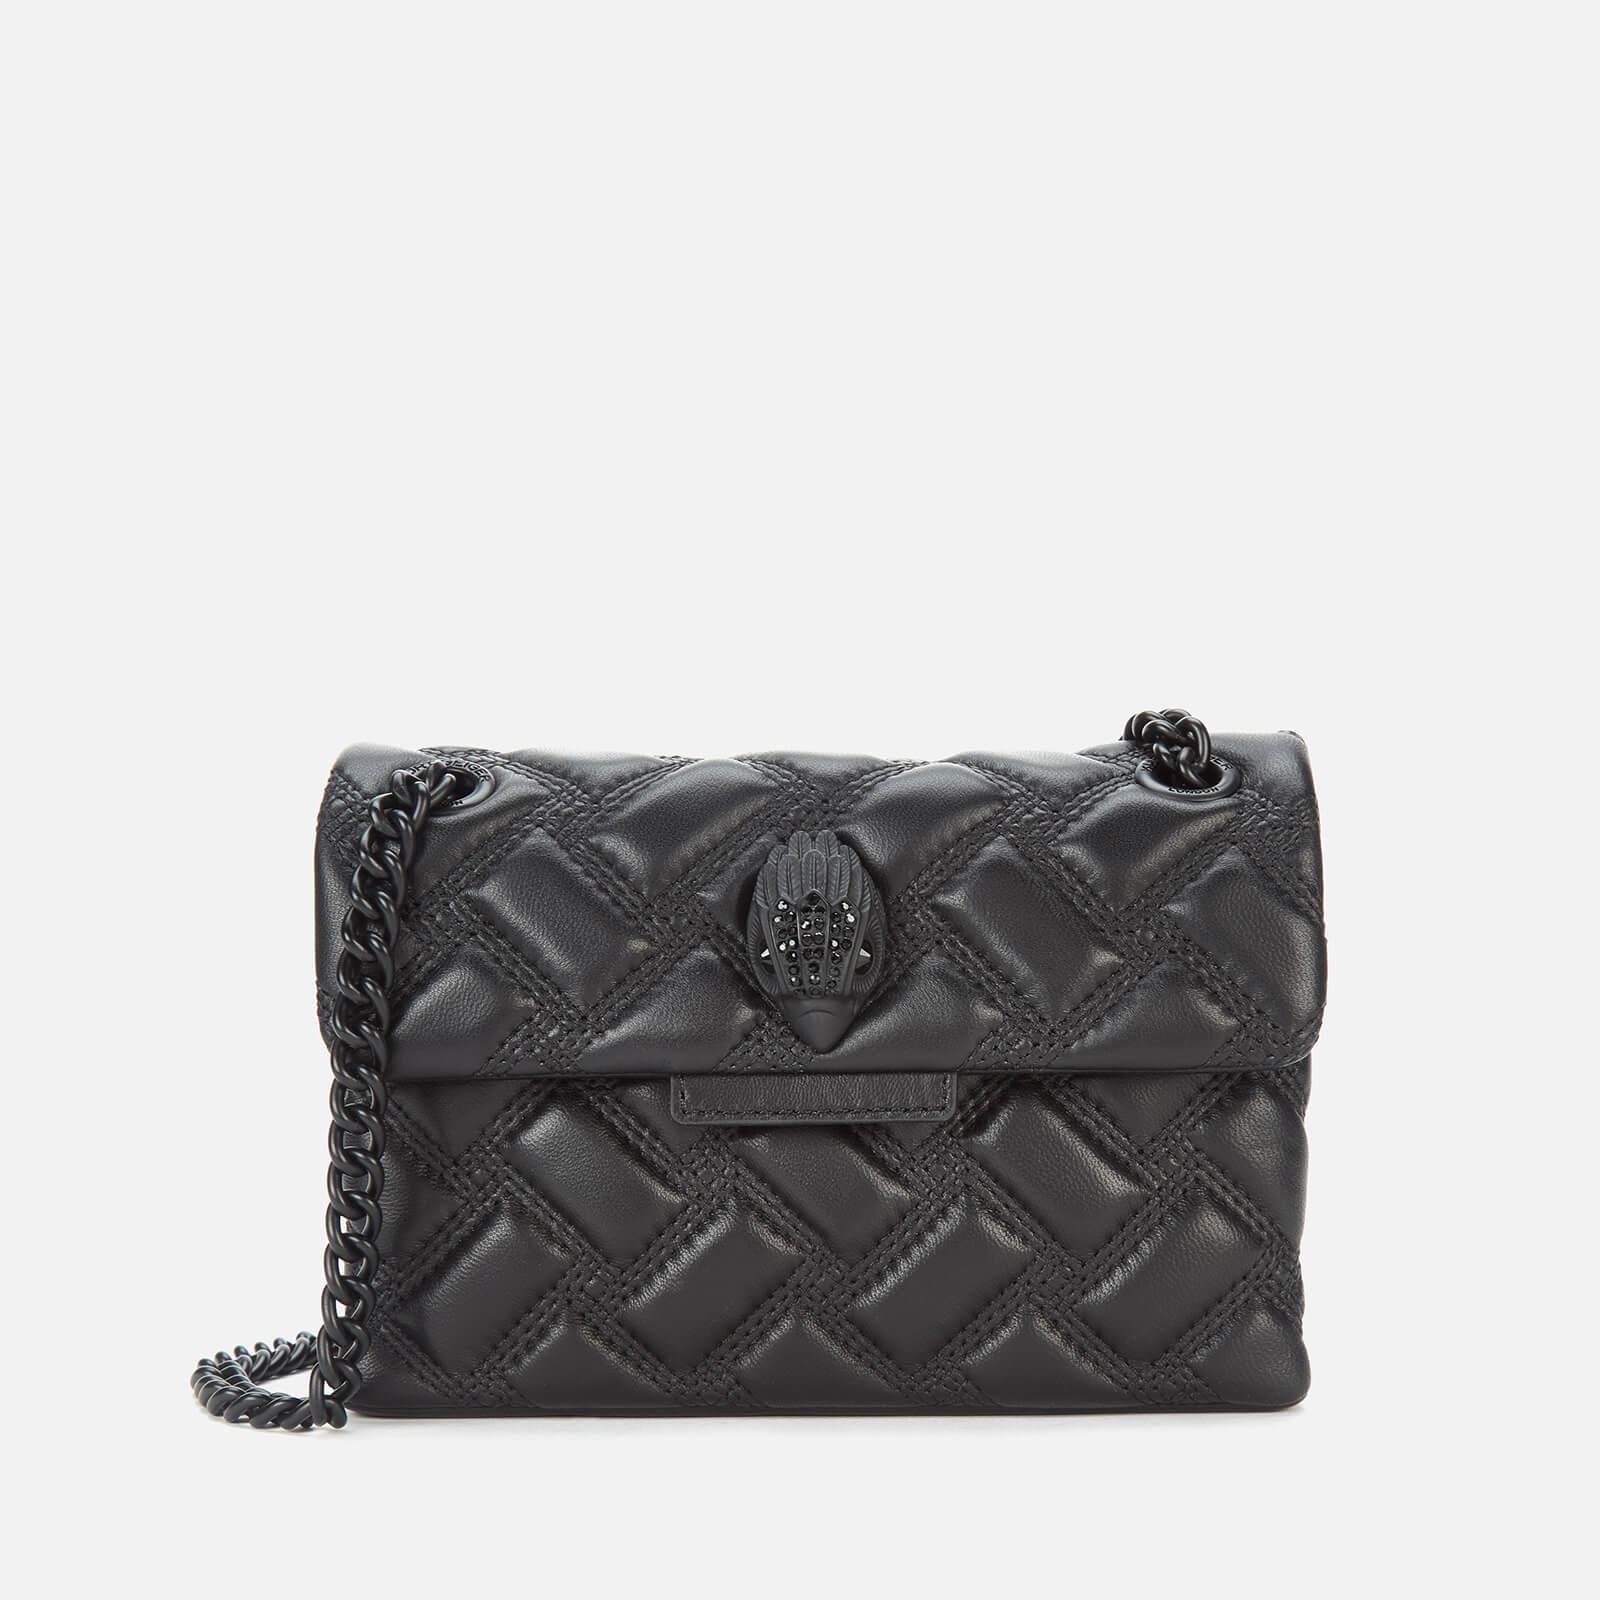 Kurt Geiger London Women's Mini Kensington Drench Bag - Black